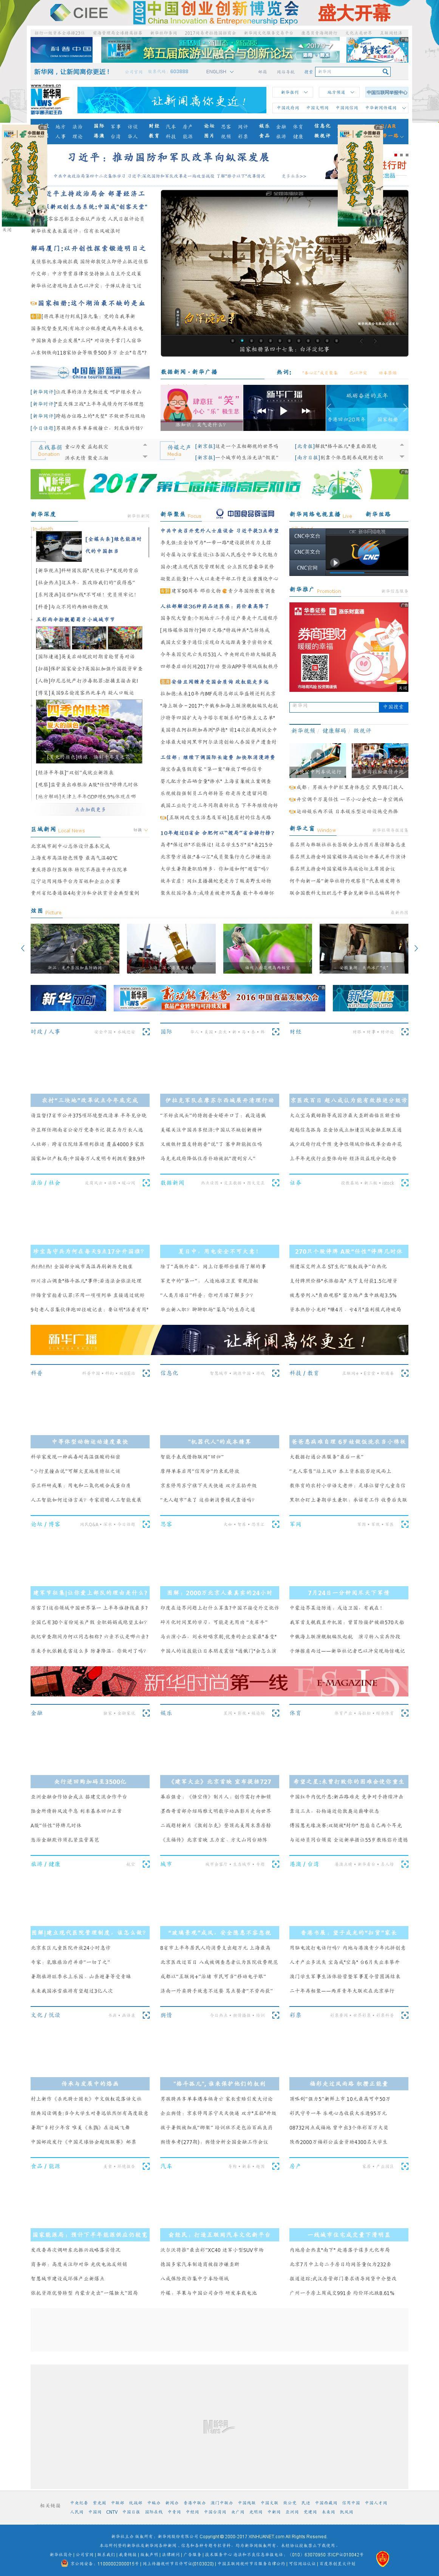 Xinhua at Tuesday July 25, 2017, 2:26 p.m. UTC